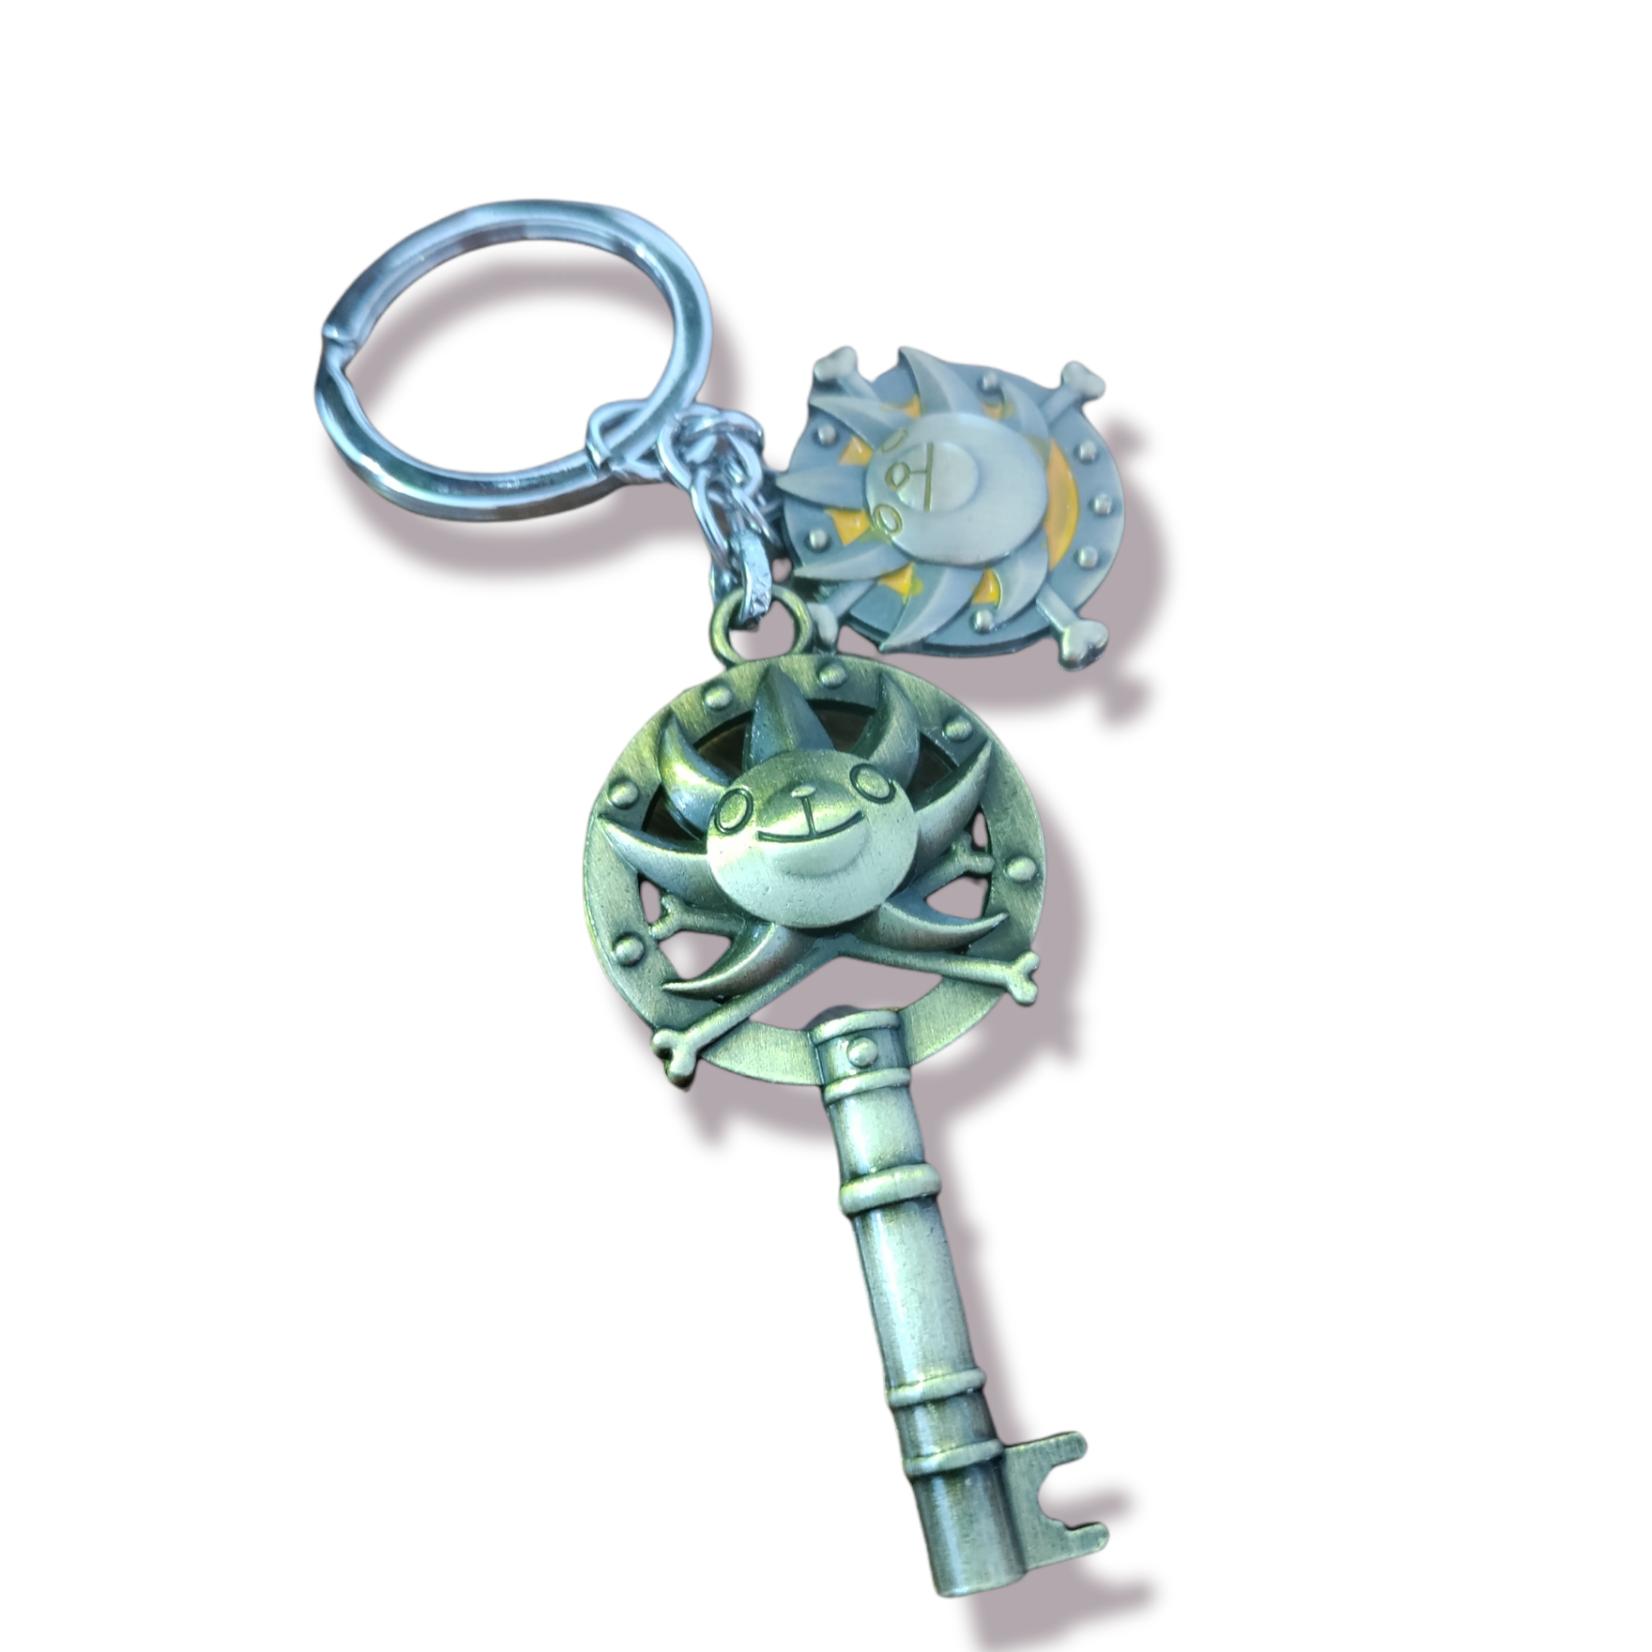 ONE PIECE Keychain Deluxe - Sunny key